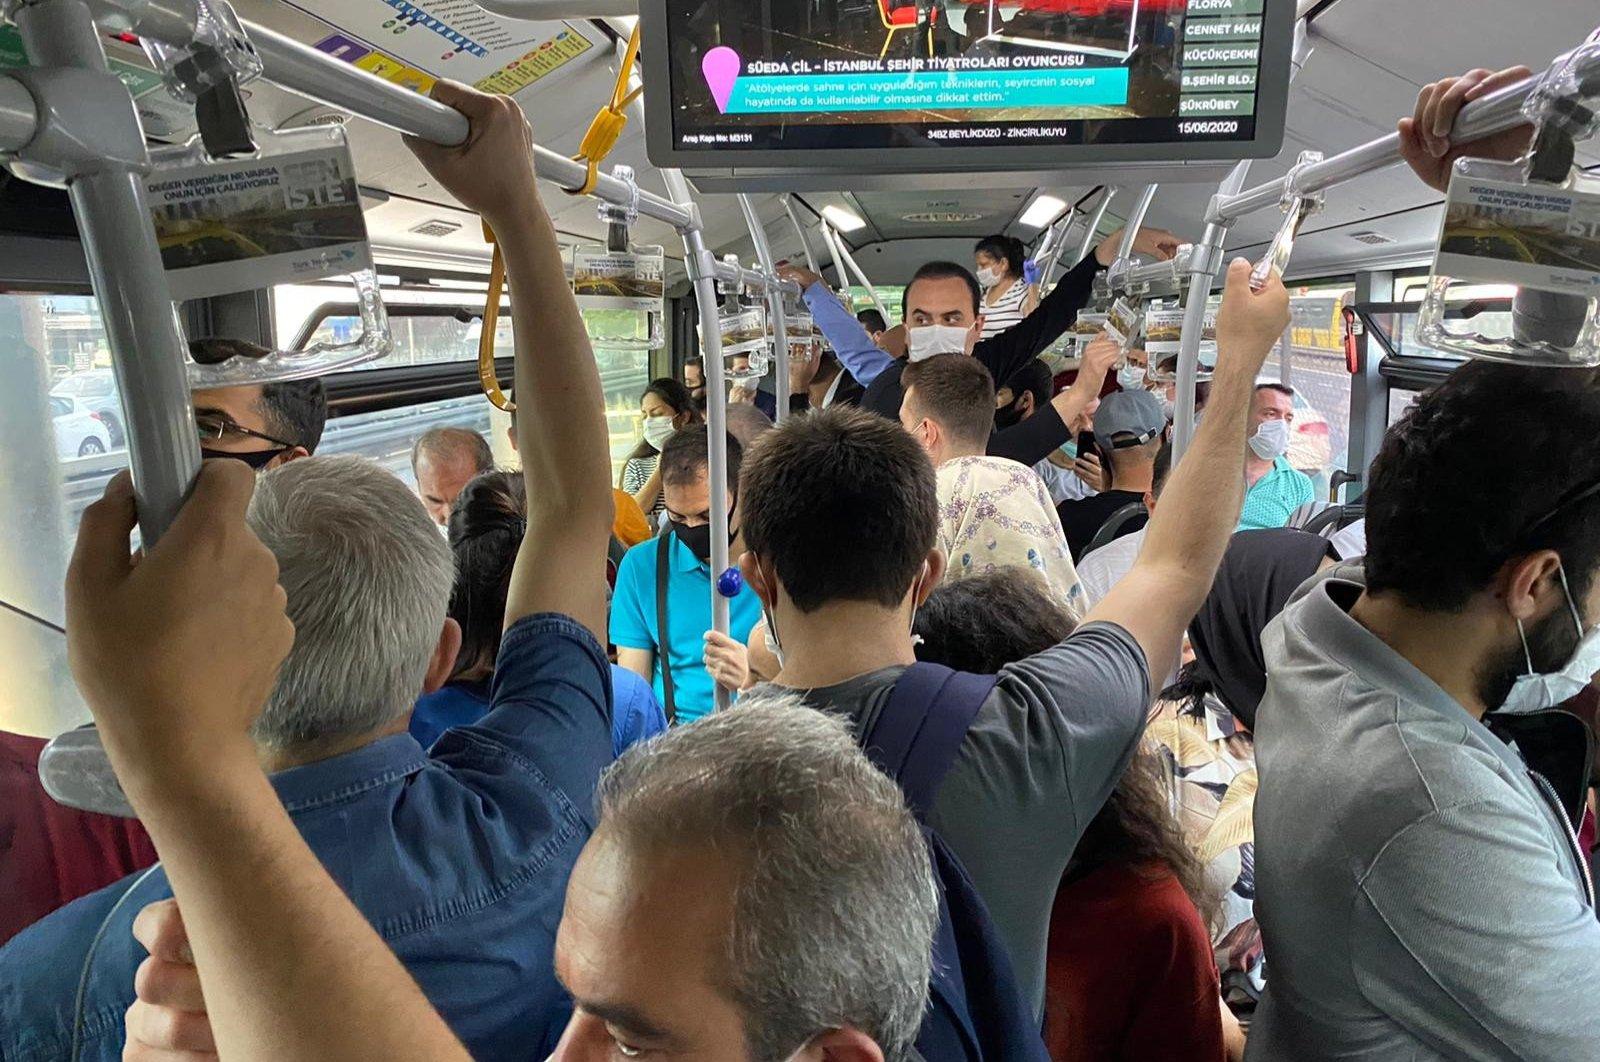 People travel in a metrobus, in Istanbul, Turkey, June 15, 2020. (IHA Photo)